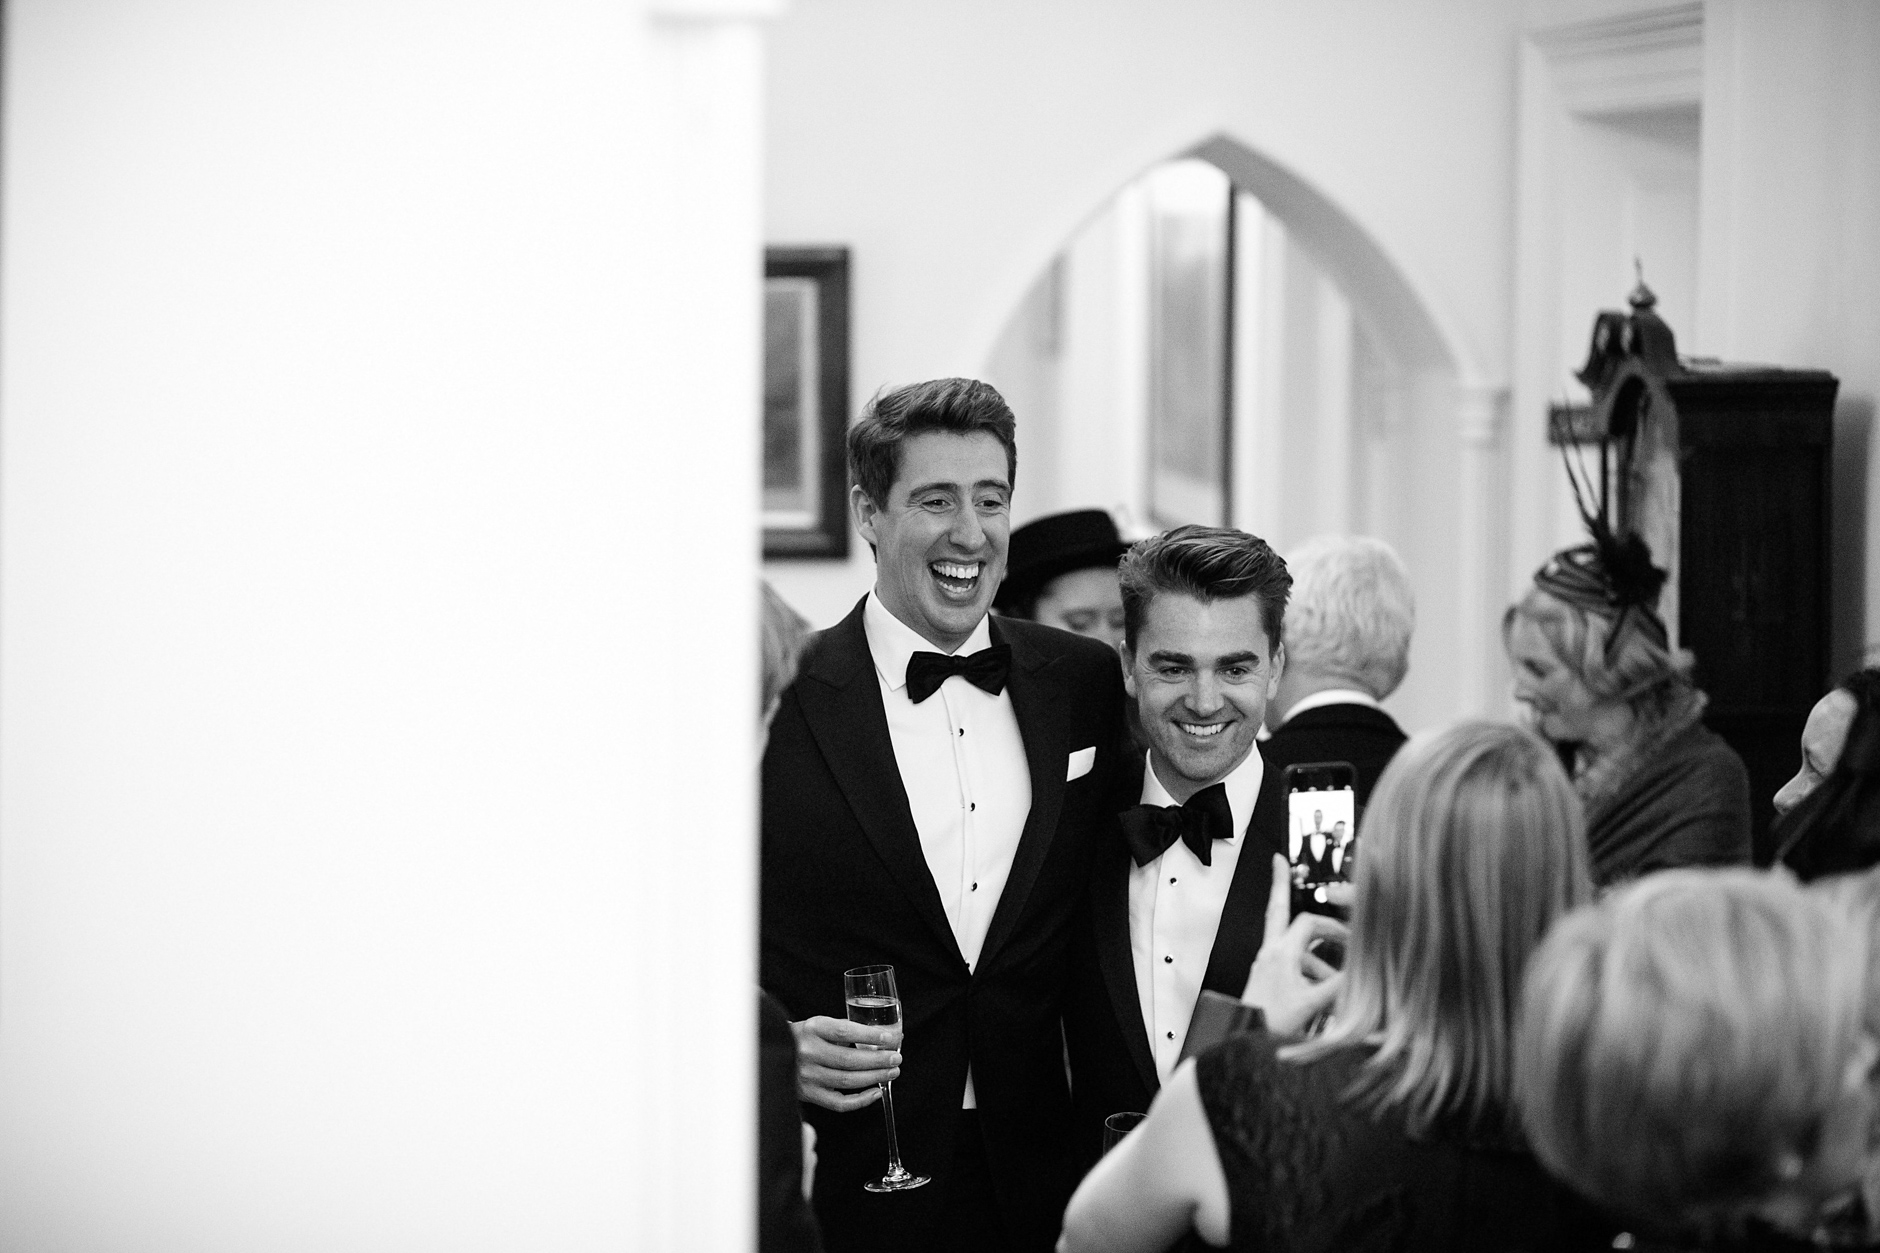 Glentruim-Wedding-Nikki-Leadbetter-Photography-254.jpg